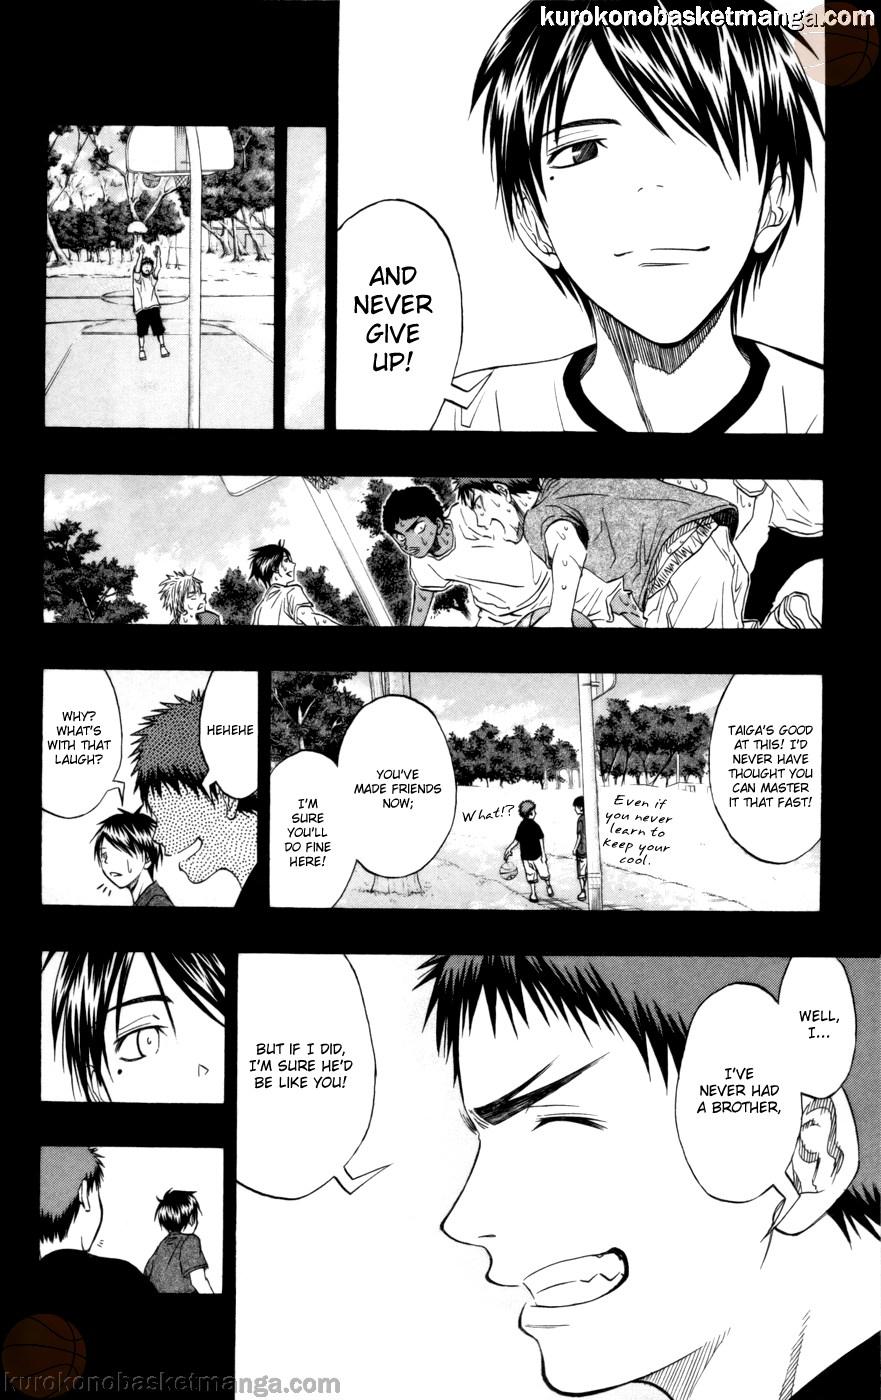 Kuroko no Basket Manga Chapter 76 - Image 08